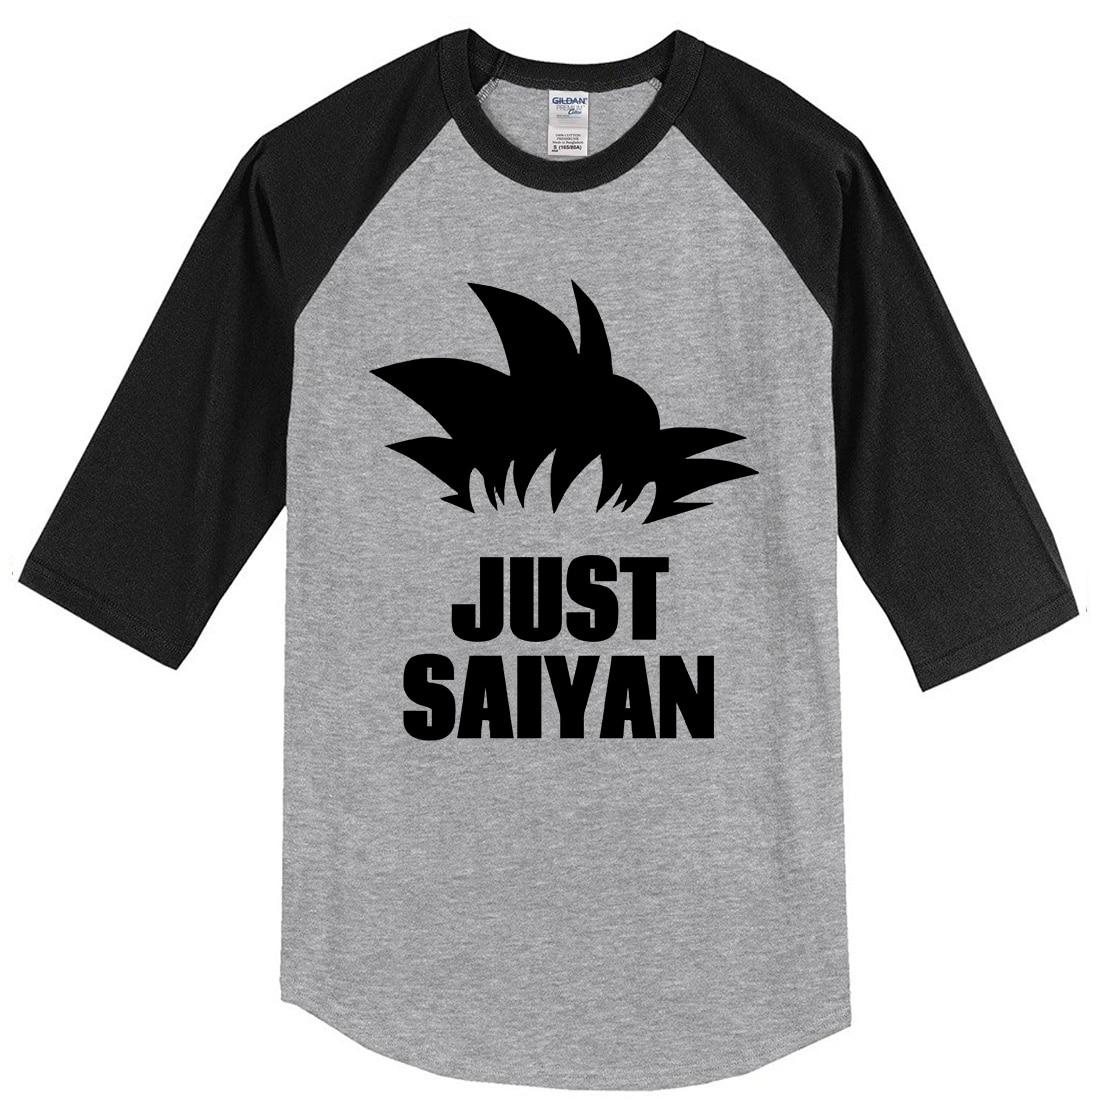 Dragon Ball Z Men T Shirt 2019 Spring Summer Fashion Cotton Shirt JUST SAIYAN Anime Man's T-shirt Streetwear Top Casual Tshirt